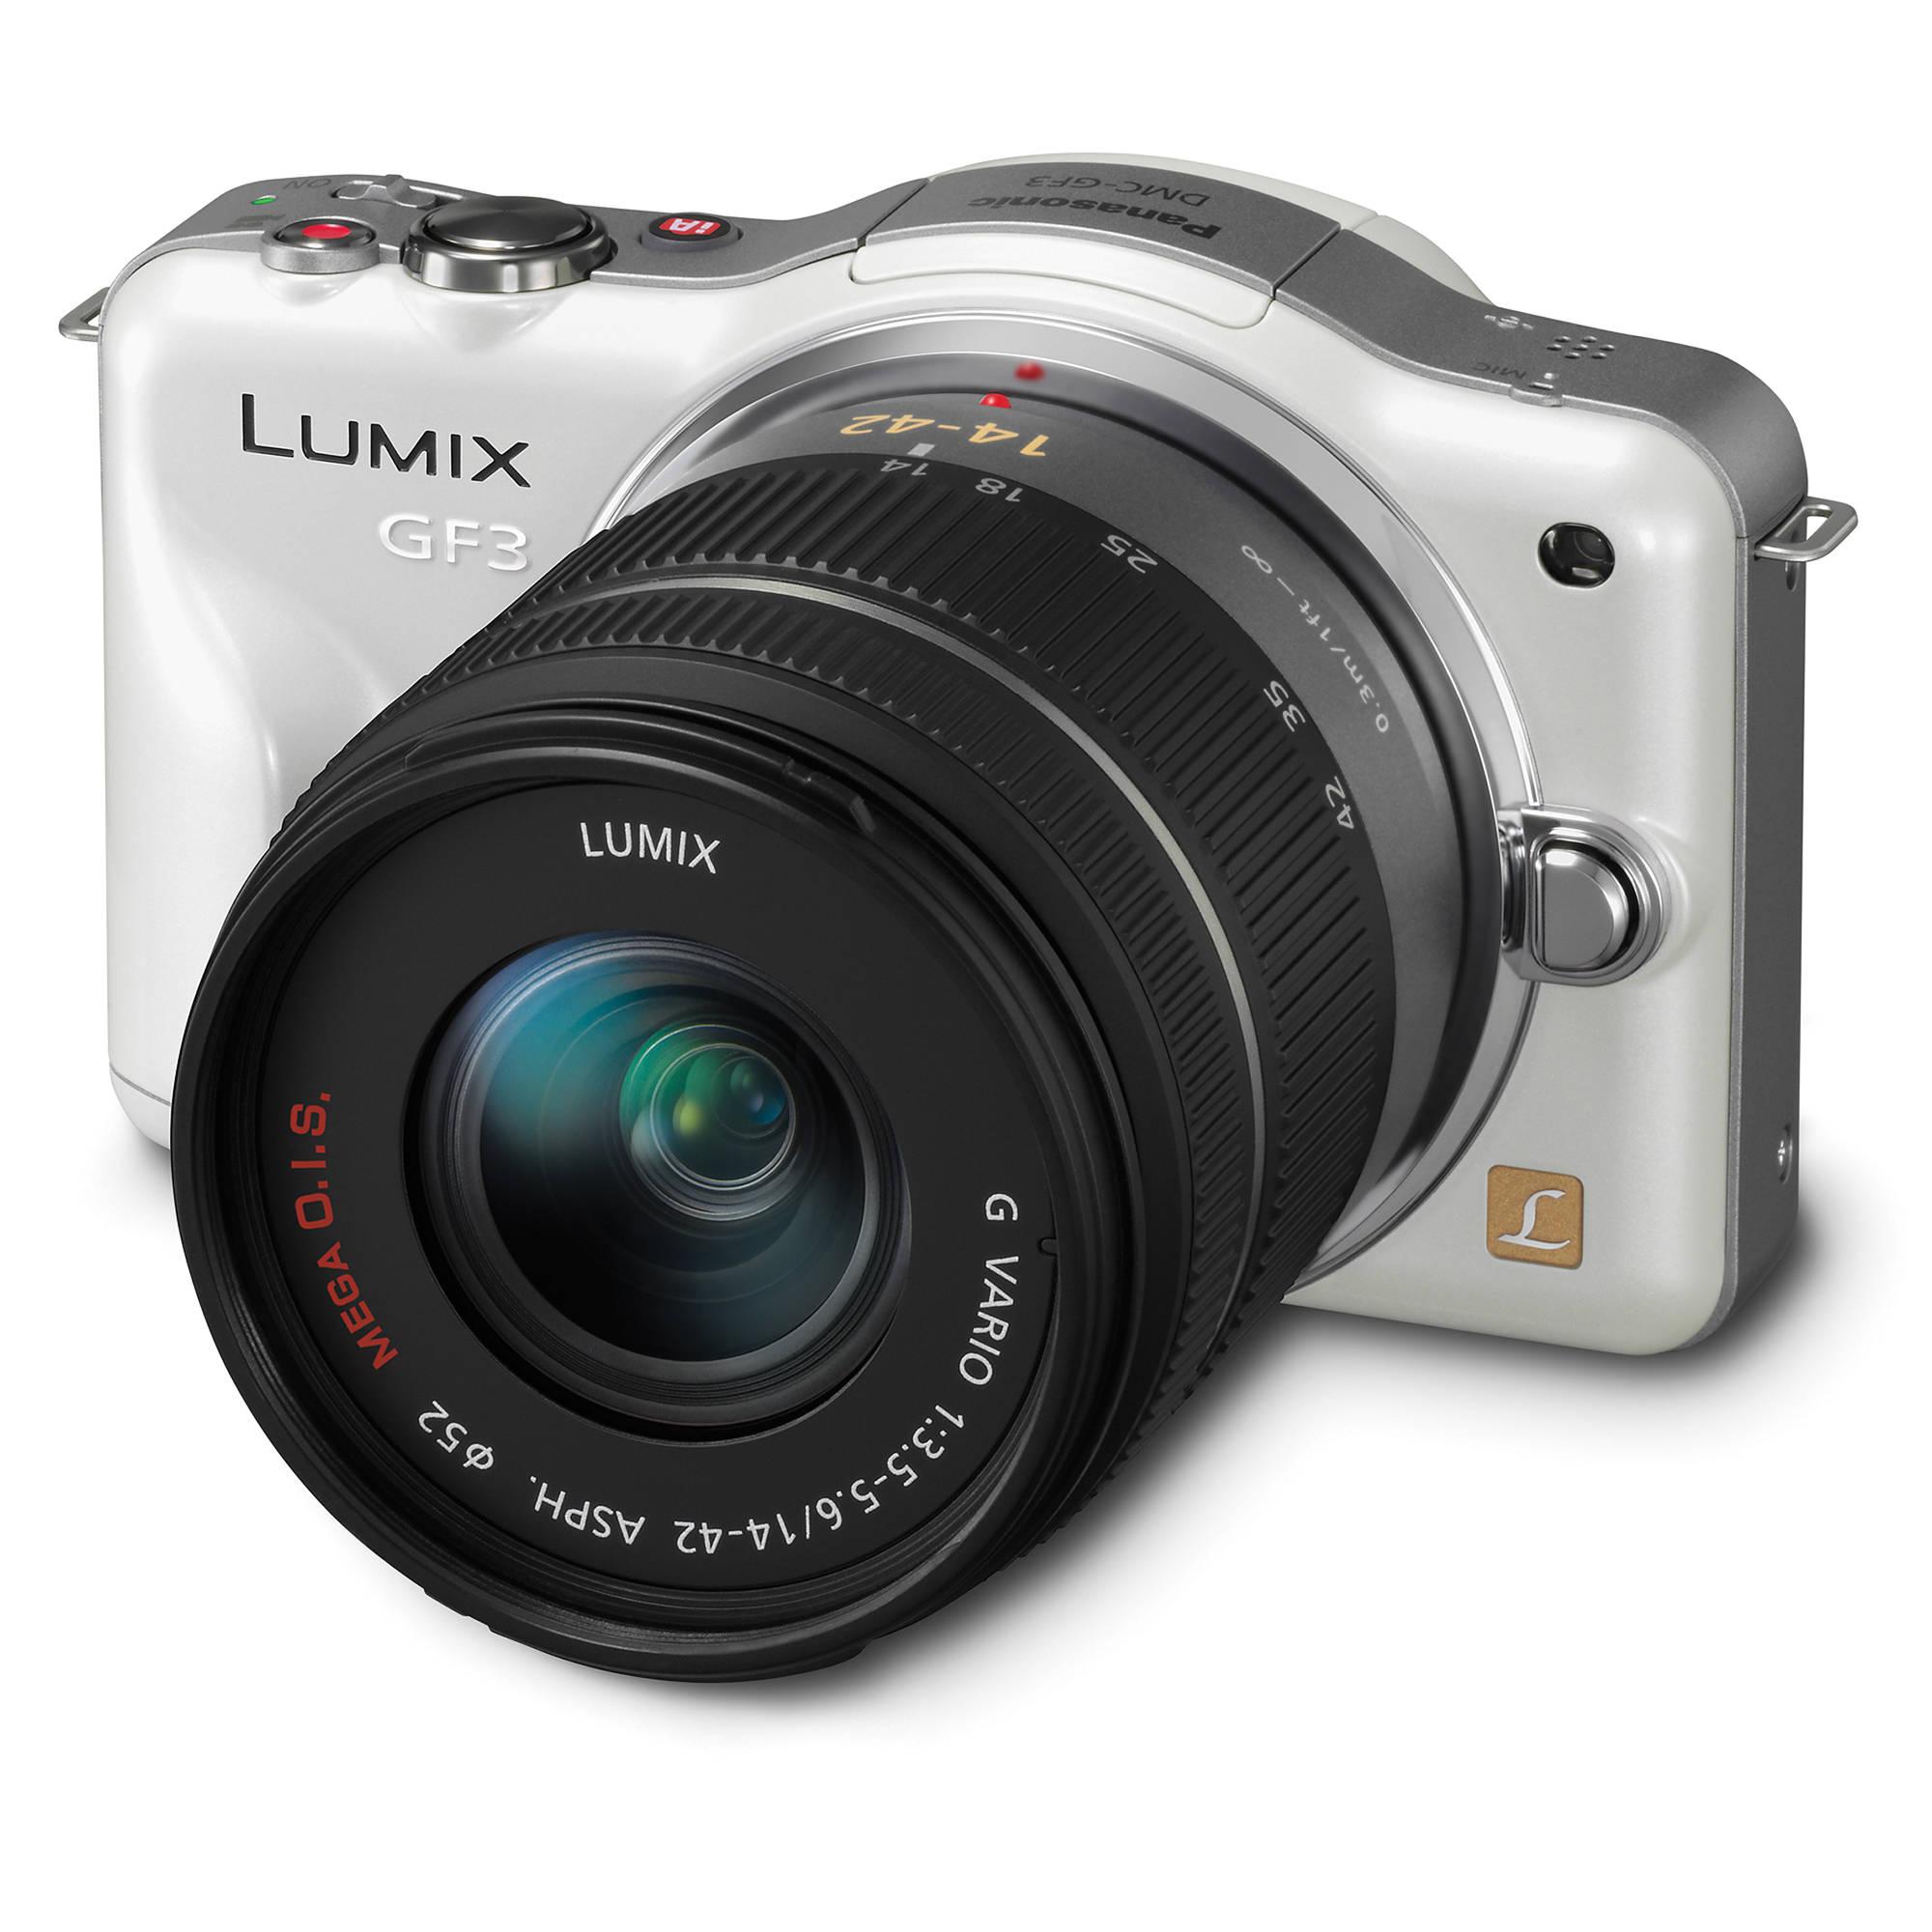 panasonic lumix dmc gf3 digital camera with 14 42mm dmc gf3kw rh bhphotovideo com panasonic lumix dmc-gf3 user manual panasonic dmc g3 user manual